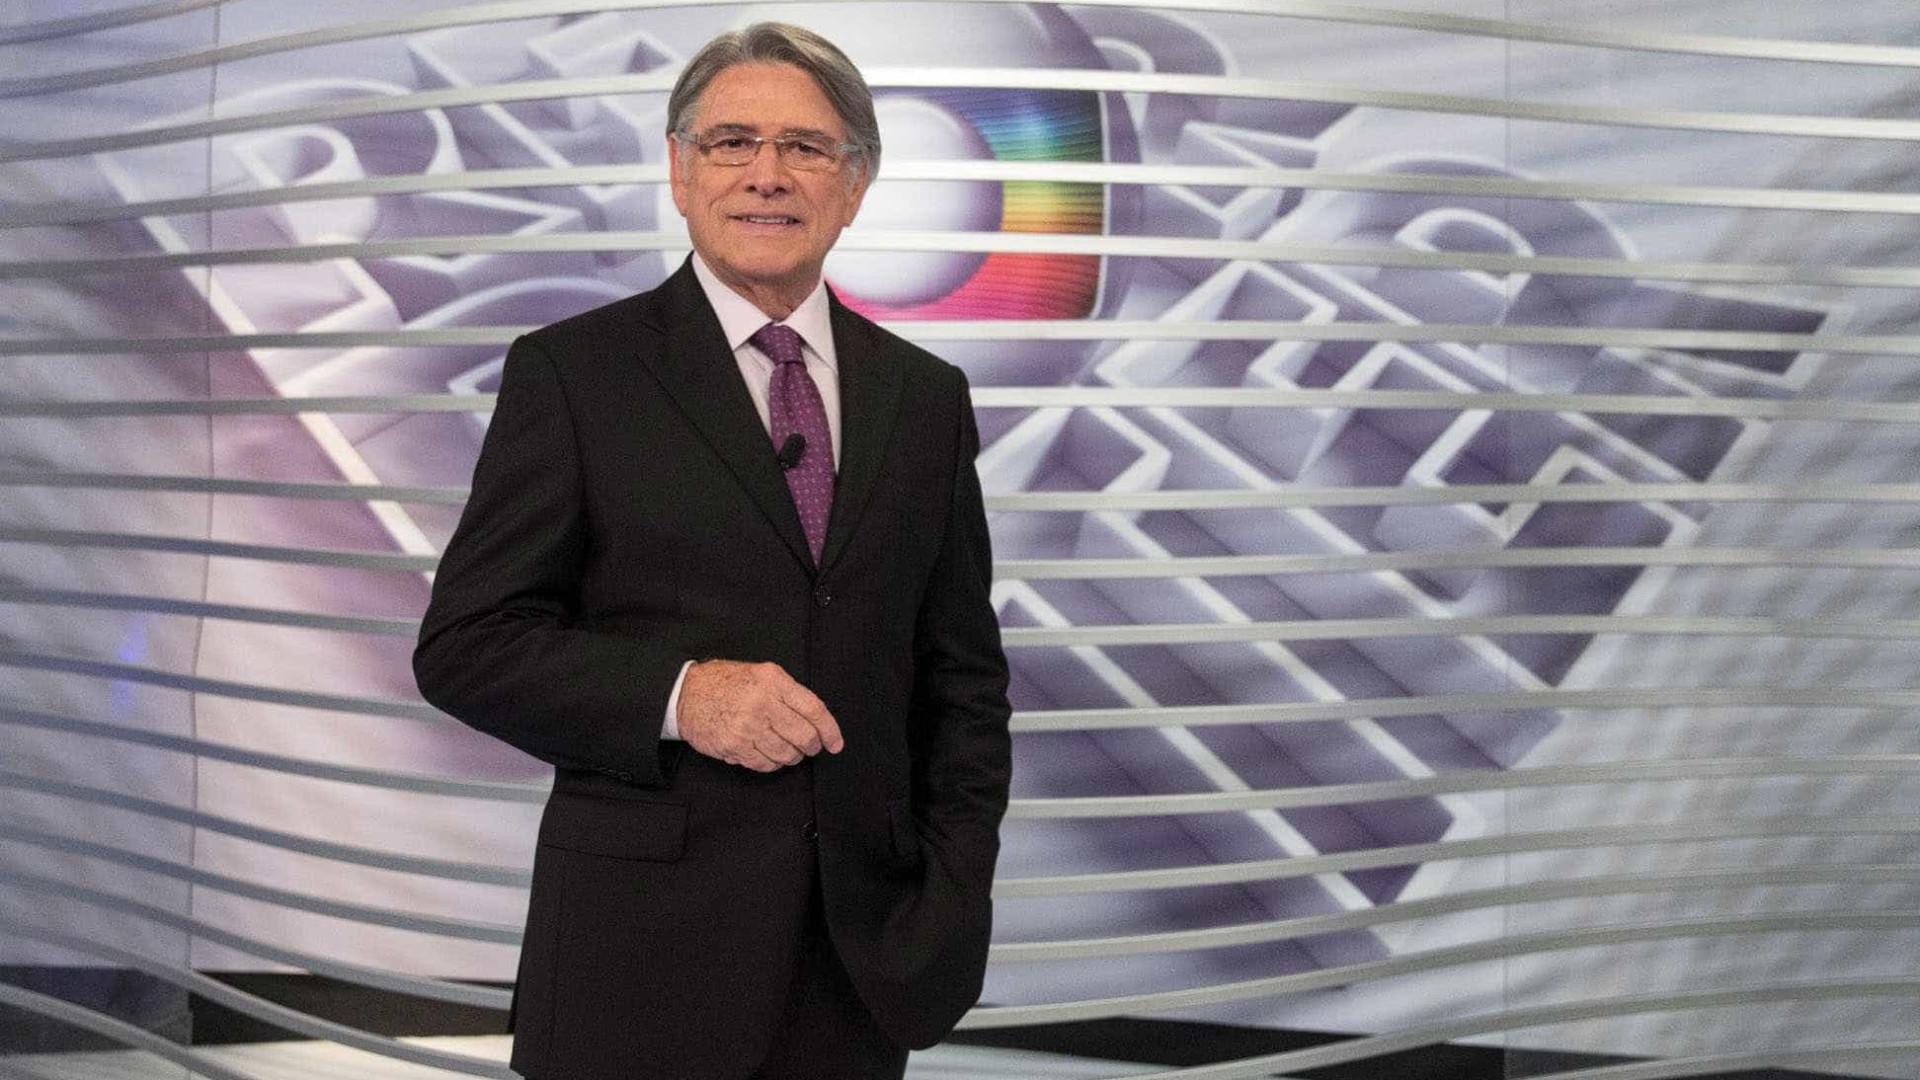 Apresentador do 'Globo Repórter', Sérgio Chapelin vai se aposentar